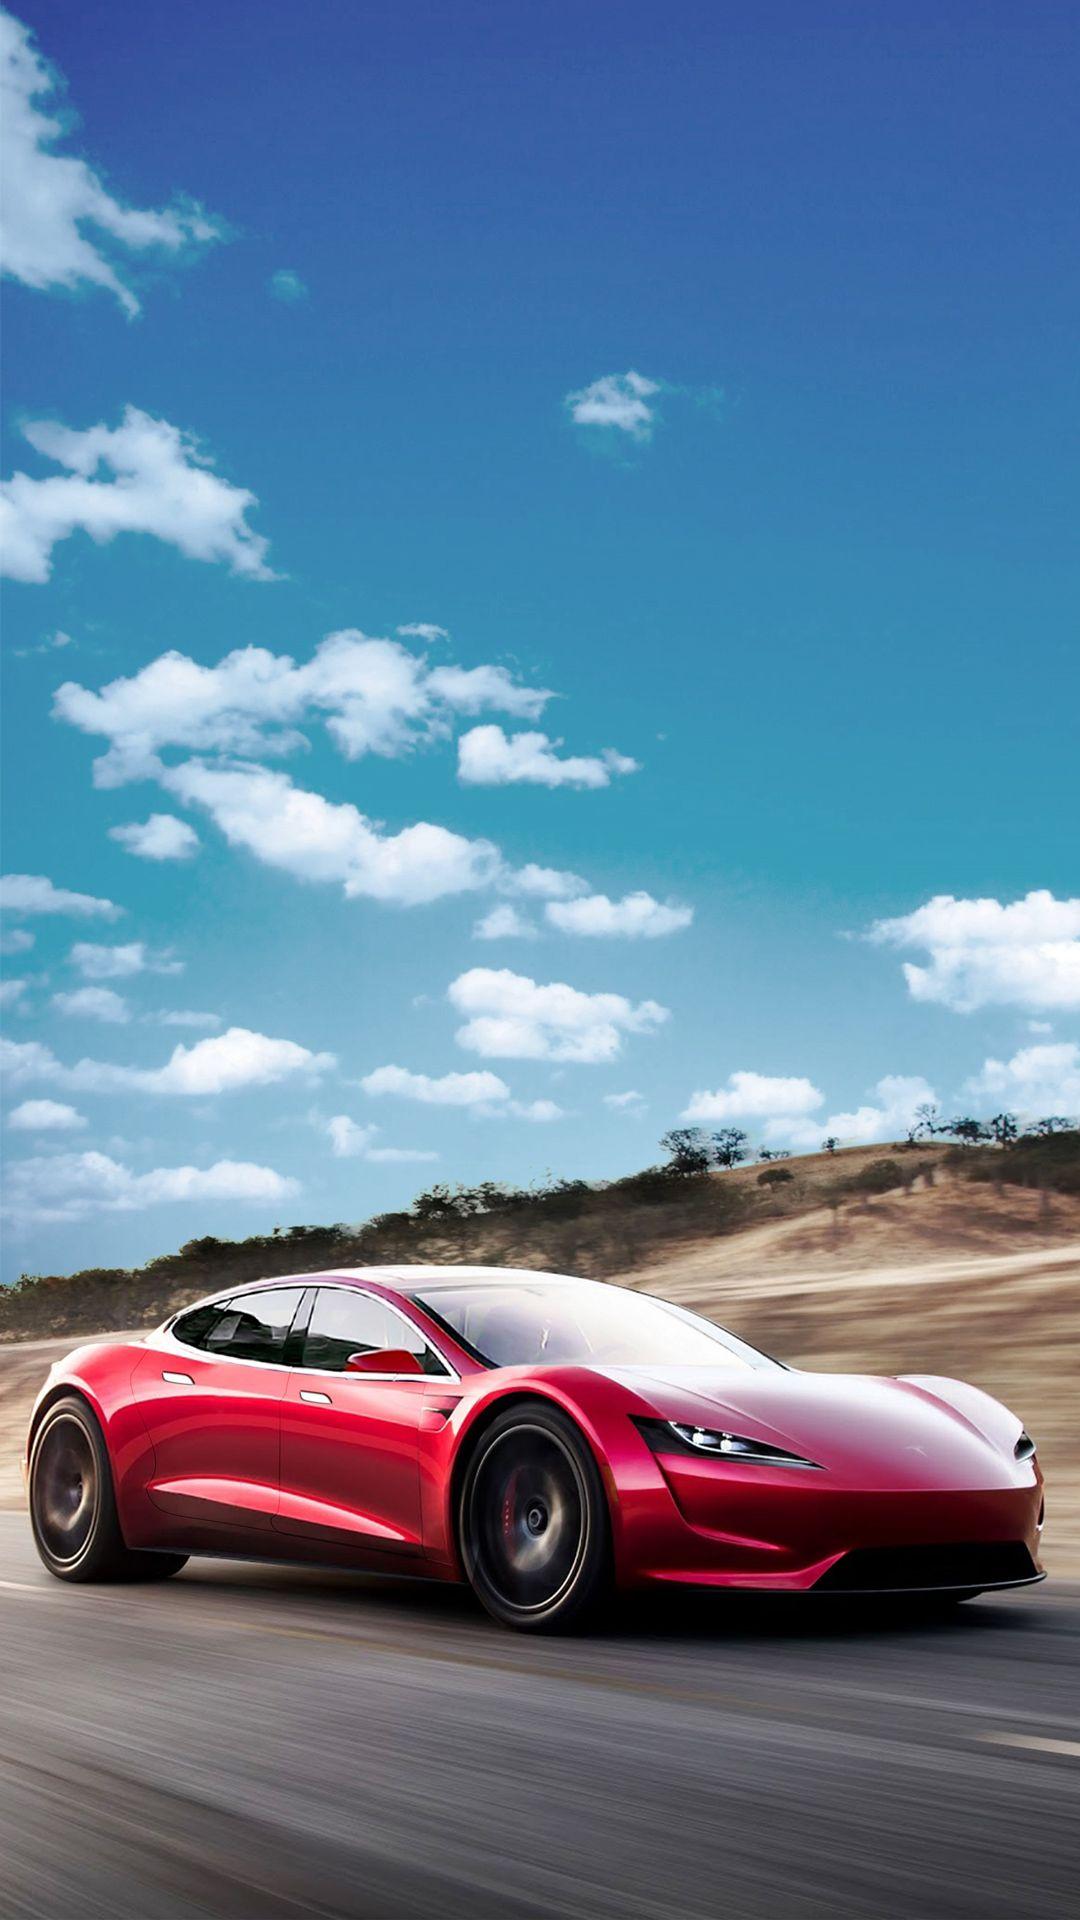 Tesla Phone Wallpapers   Top Tesla Phone Backgrounds 1080x1920